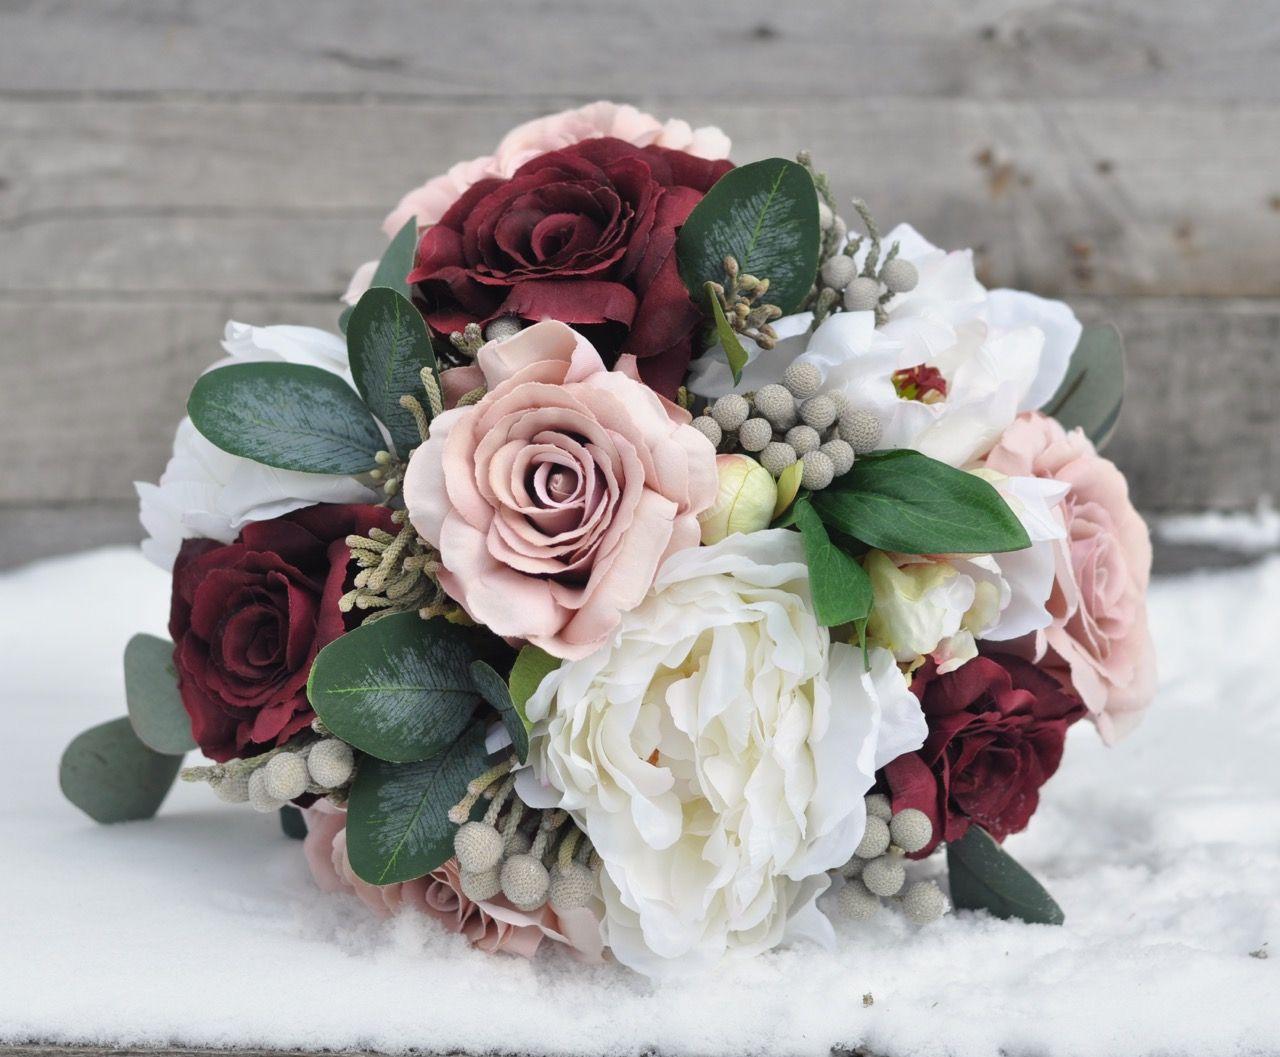 Hollys Wedding Flowers Shipping Silk Wedding Flowers From Hollys